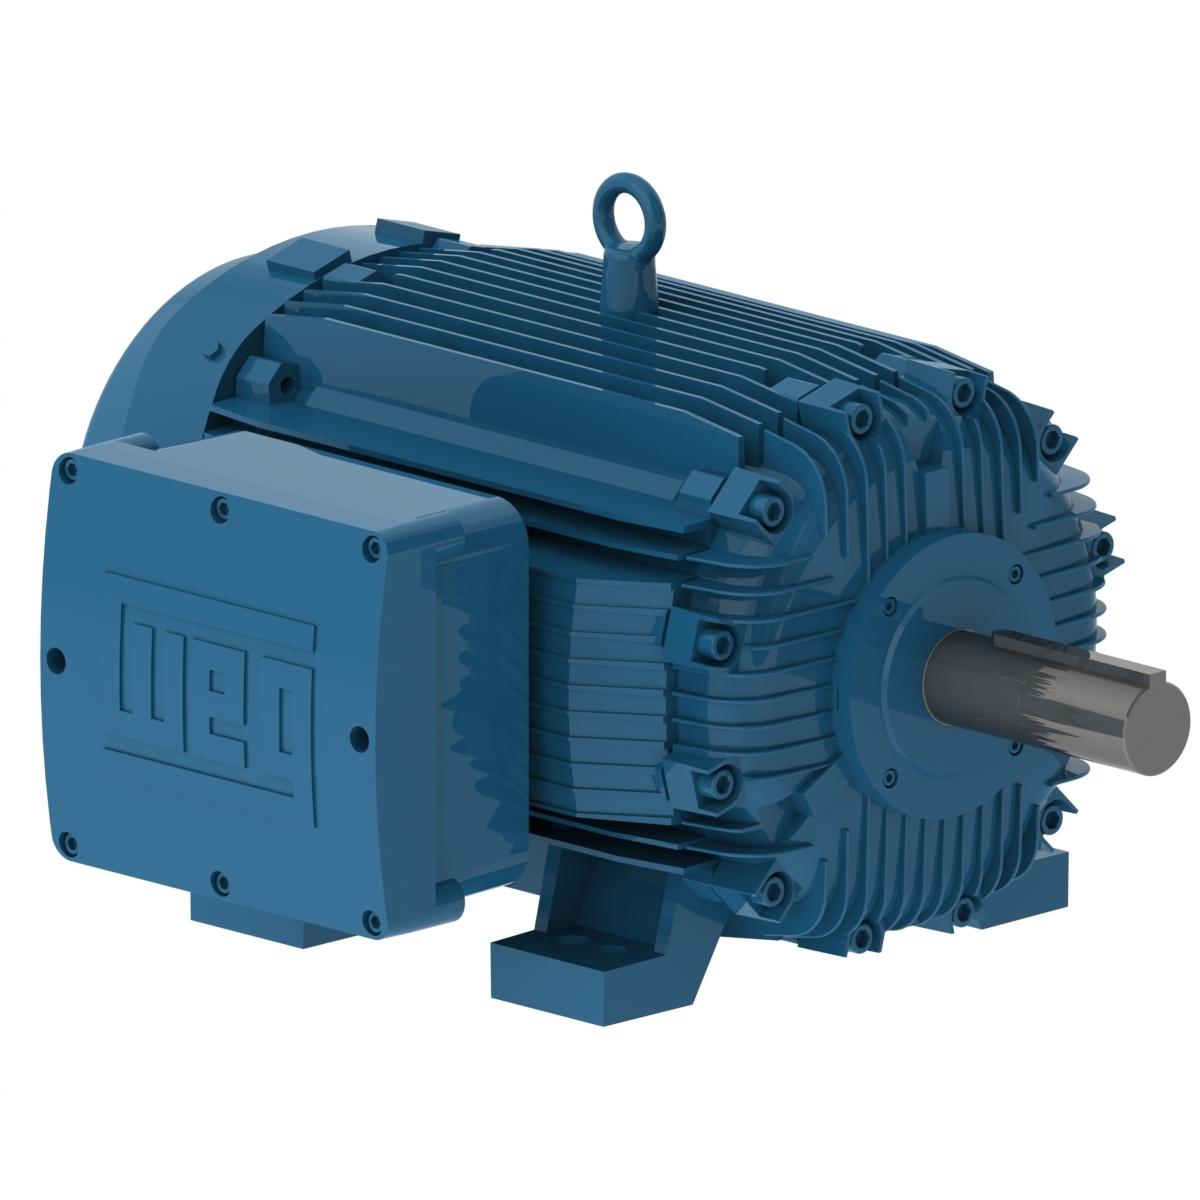 3 Phase Electric Motor Wiring Diagram W21 Flameproof Motor High Efficiency 250 Hp 2p 504 5ts 3ph